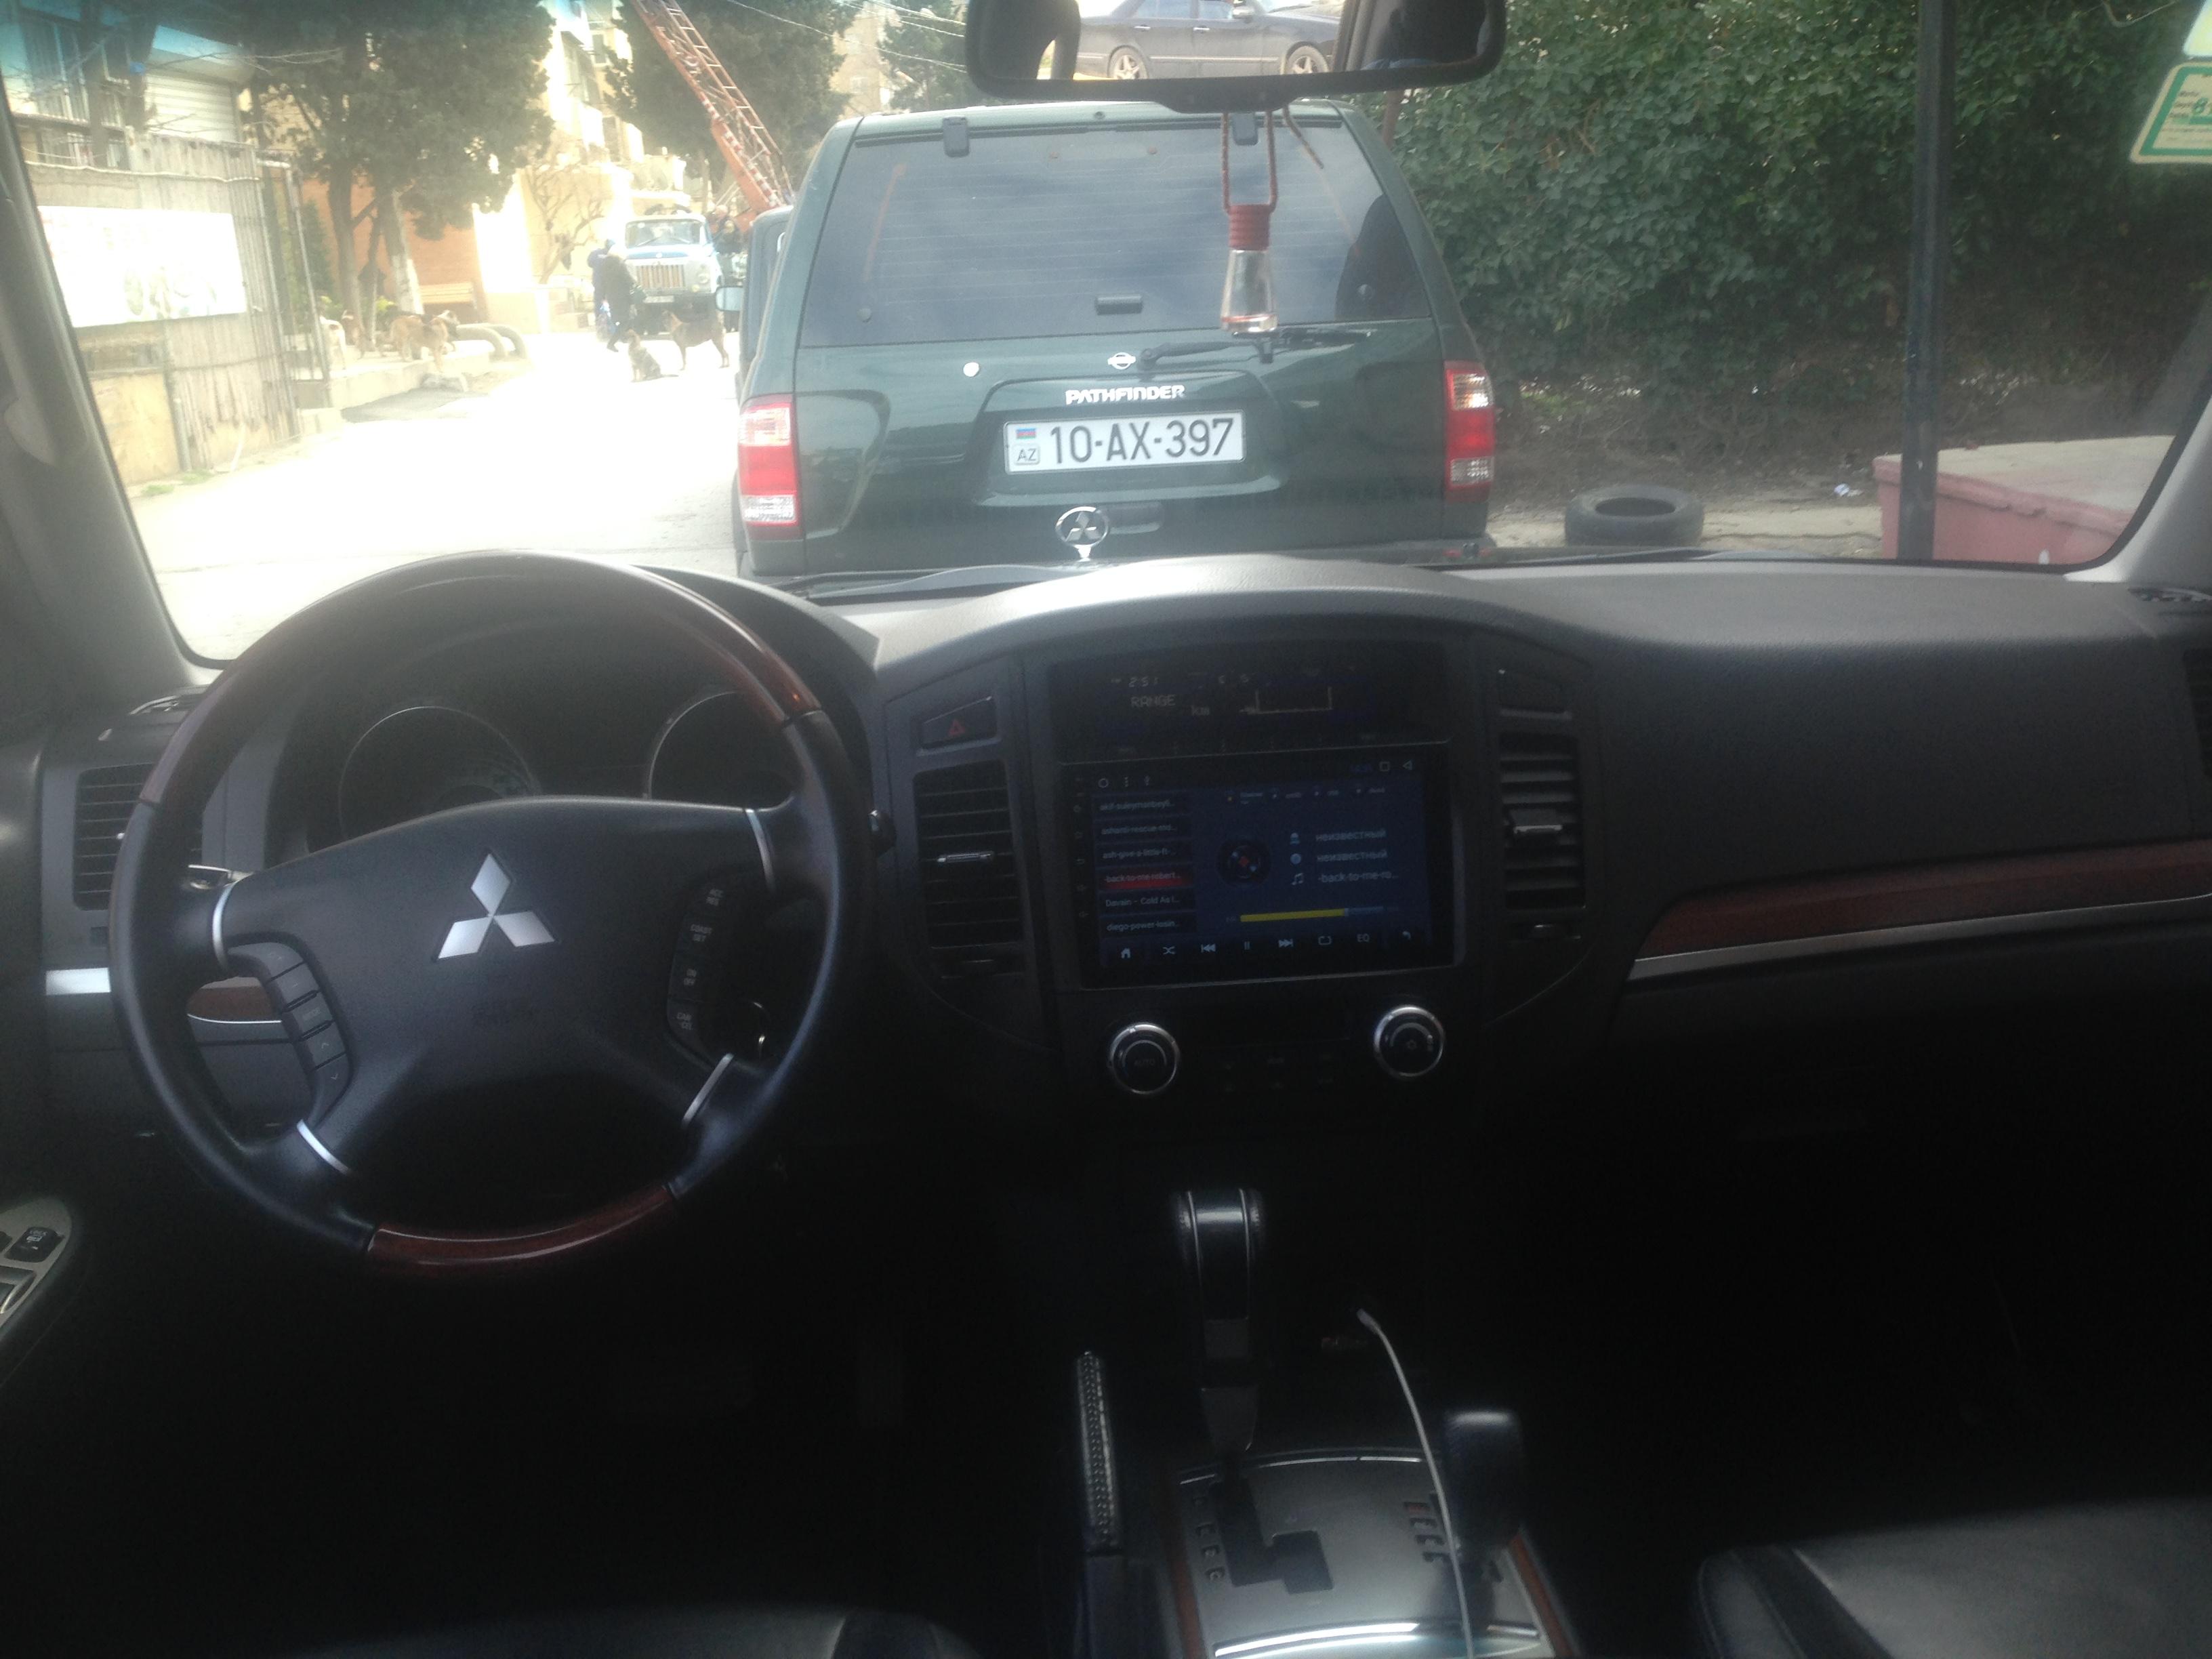 Mitsubishi Pajero 3.0(lt) 2007 Подержанный  $25000